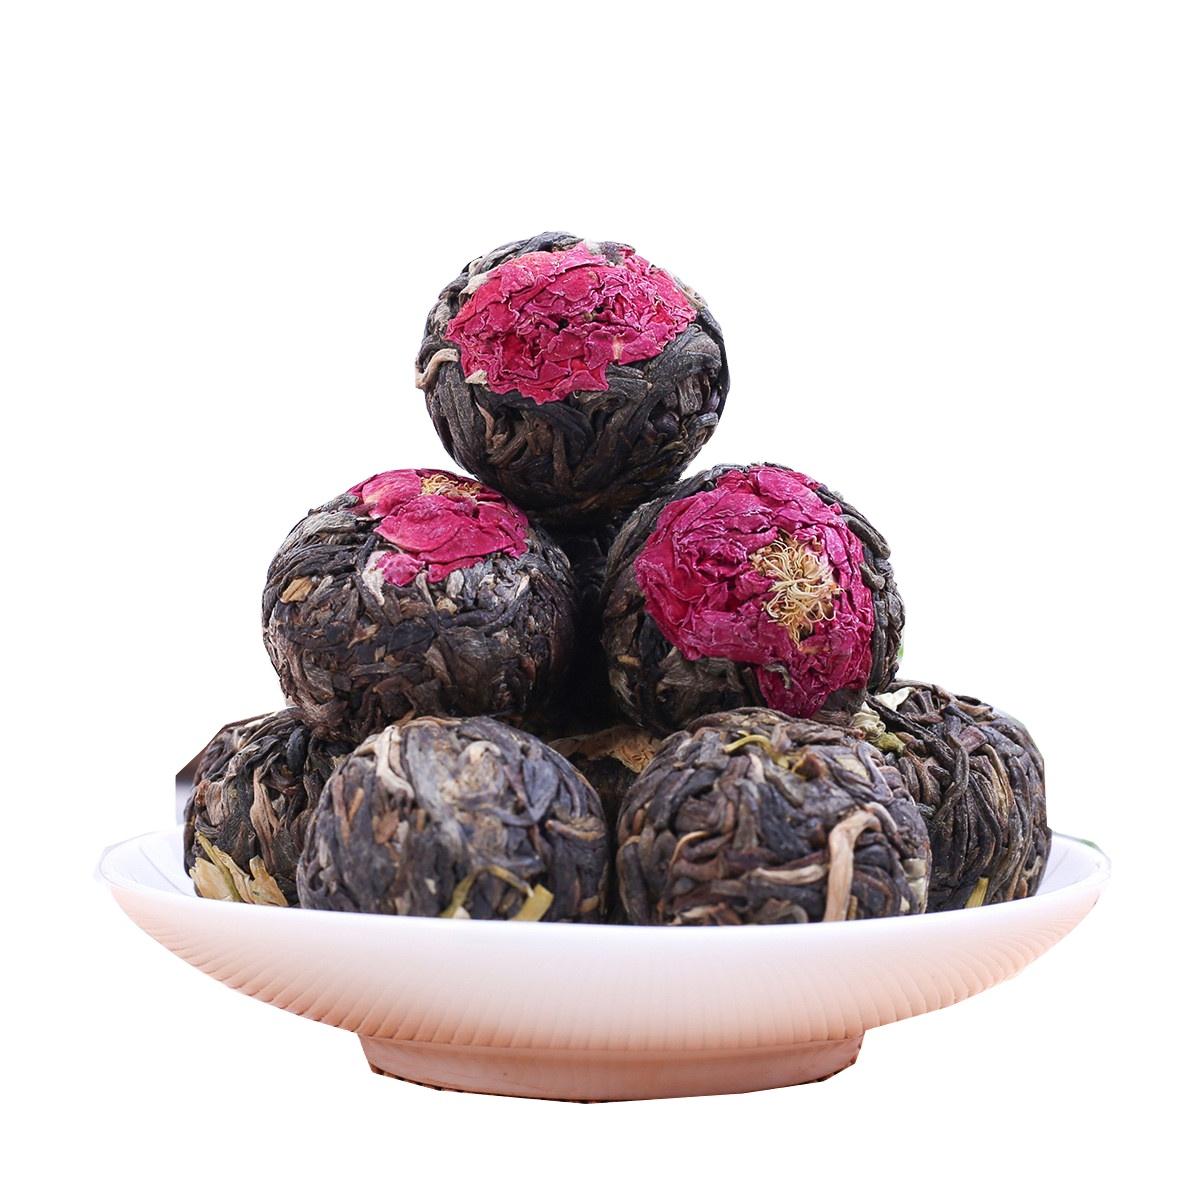 2021 New Private Label Organic Blossom Blooming Flower Tea Ball in Individual Bag for Women Detox Herbal Flowers Tea Ball - 4uTea   4uTea.com